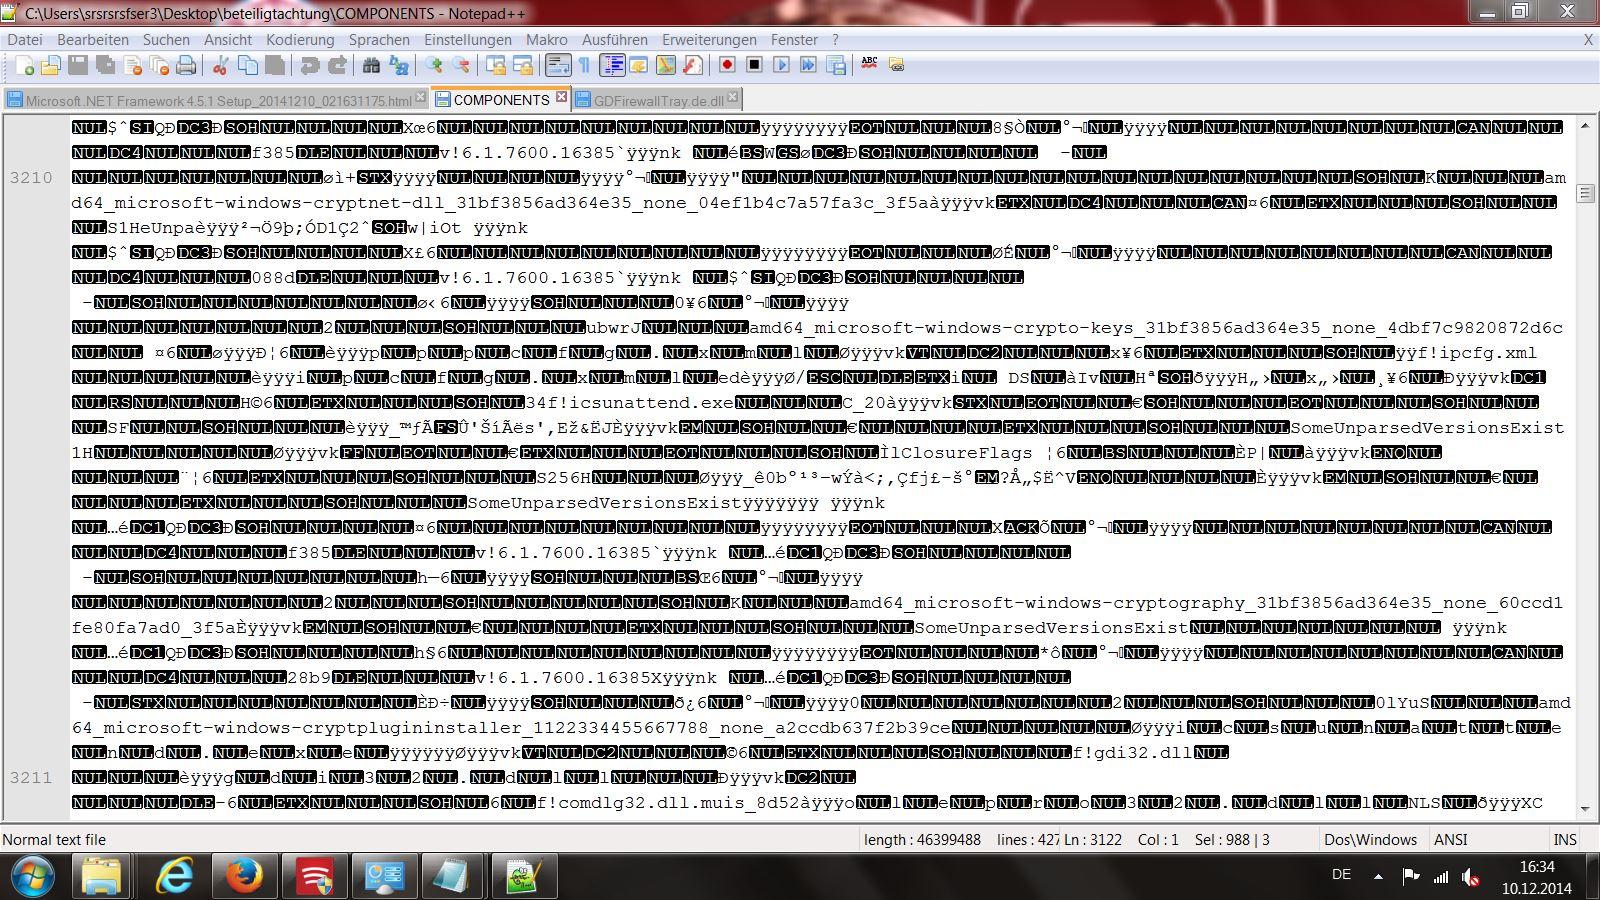 Windows7 nach Viren/Trojanerbefall neu aufgesetzt(zum 3 mal